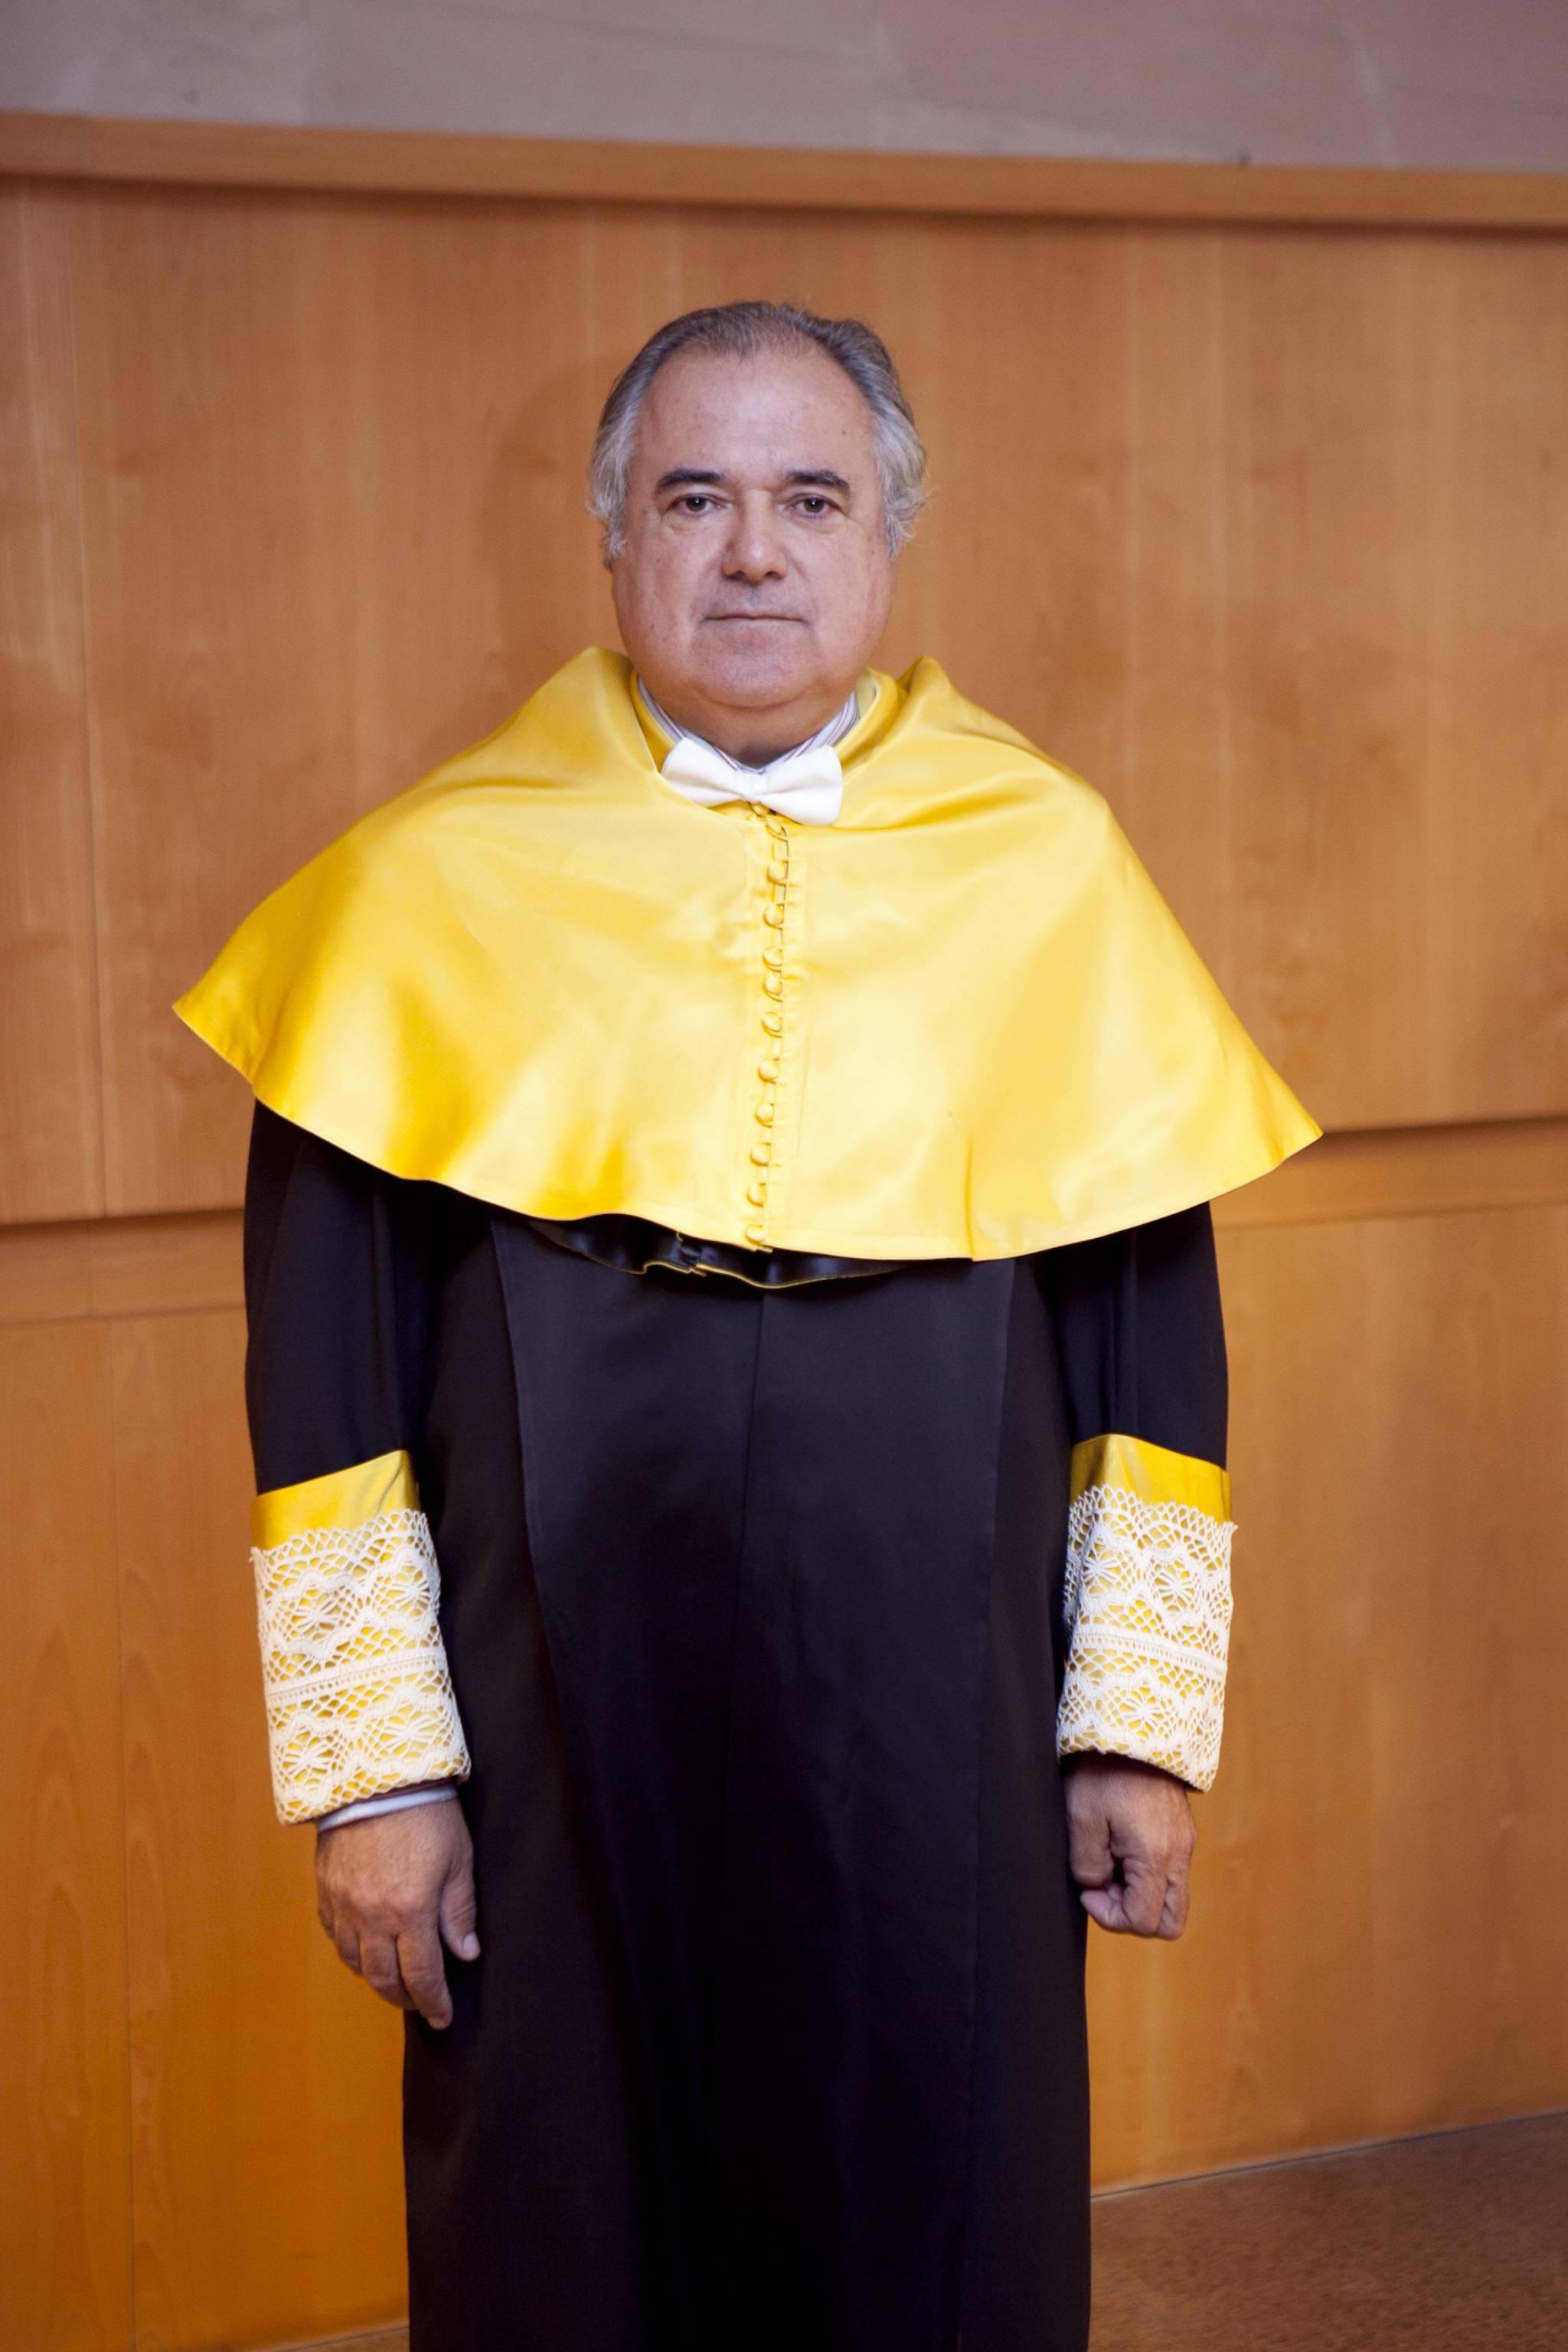 doctor-honoris-causa-luis-gamir_mg_0552.jpg